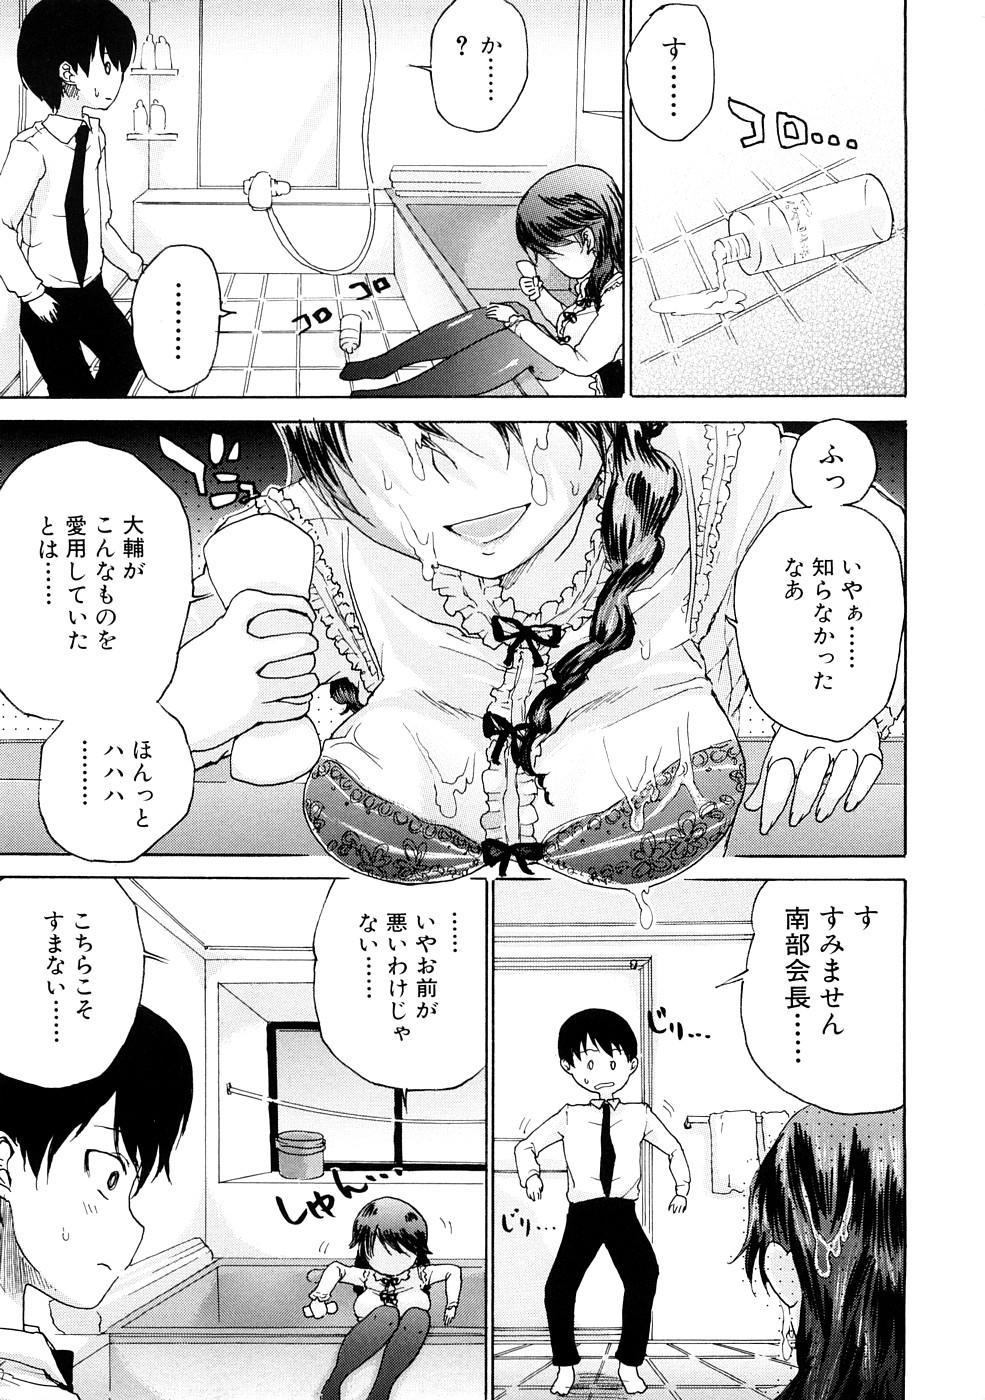 Ecchi de Jibunkatte de Kawaii Ko 134